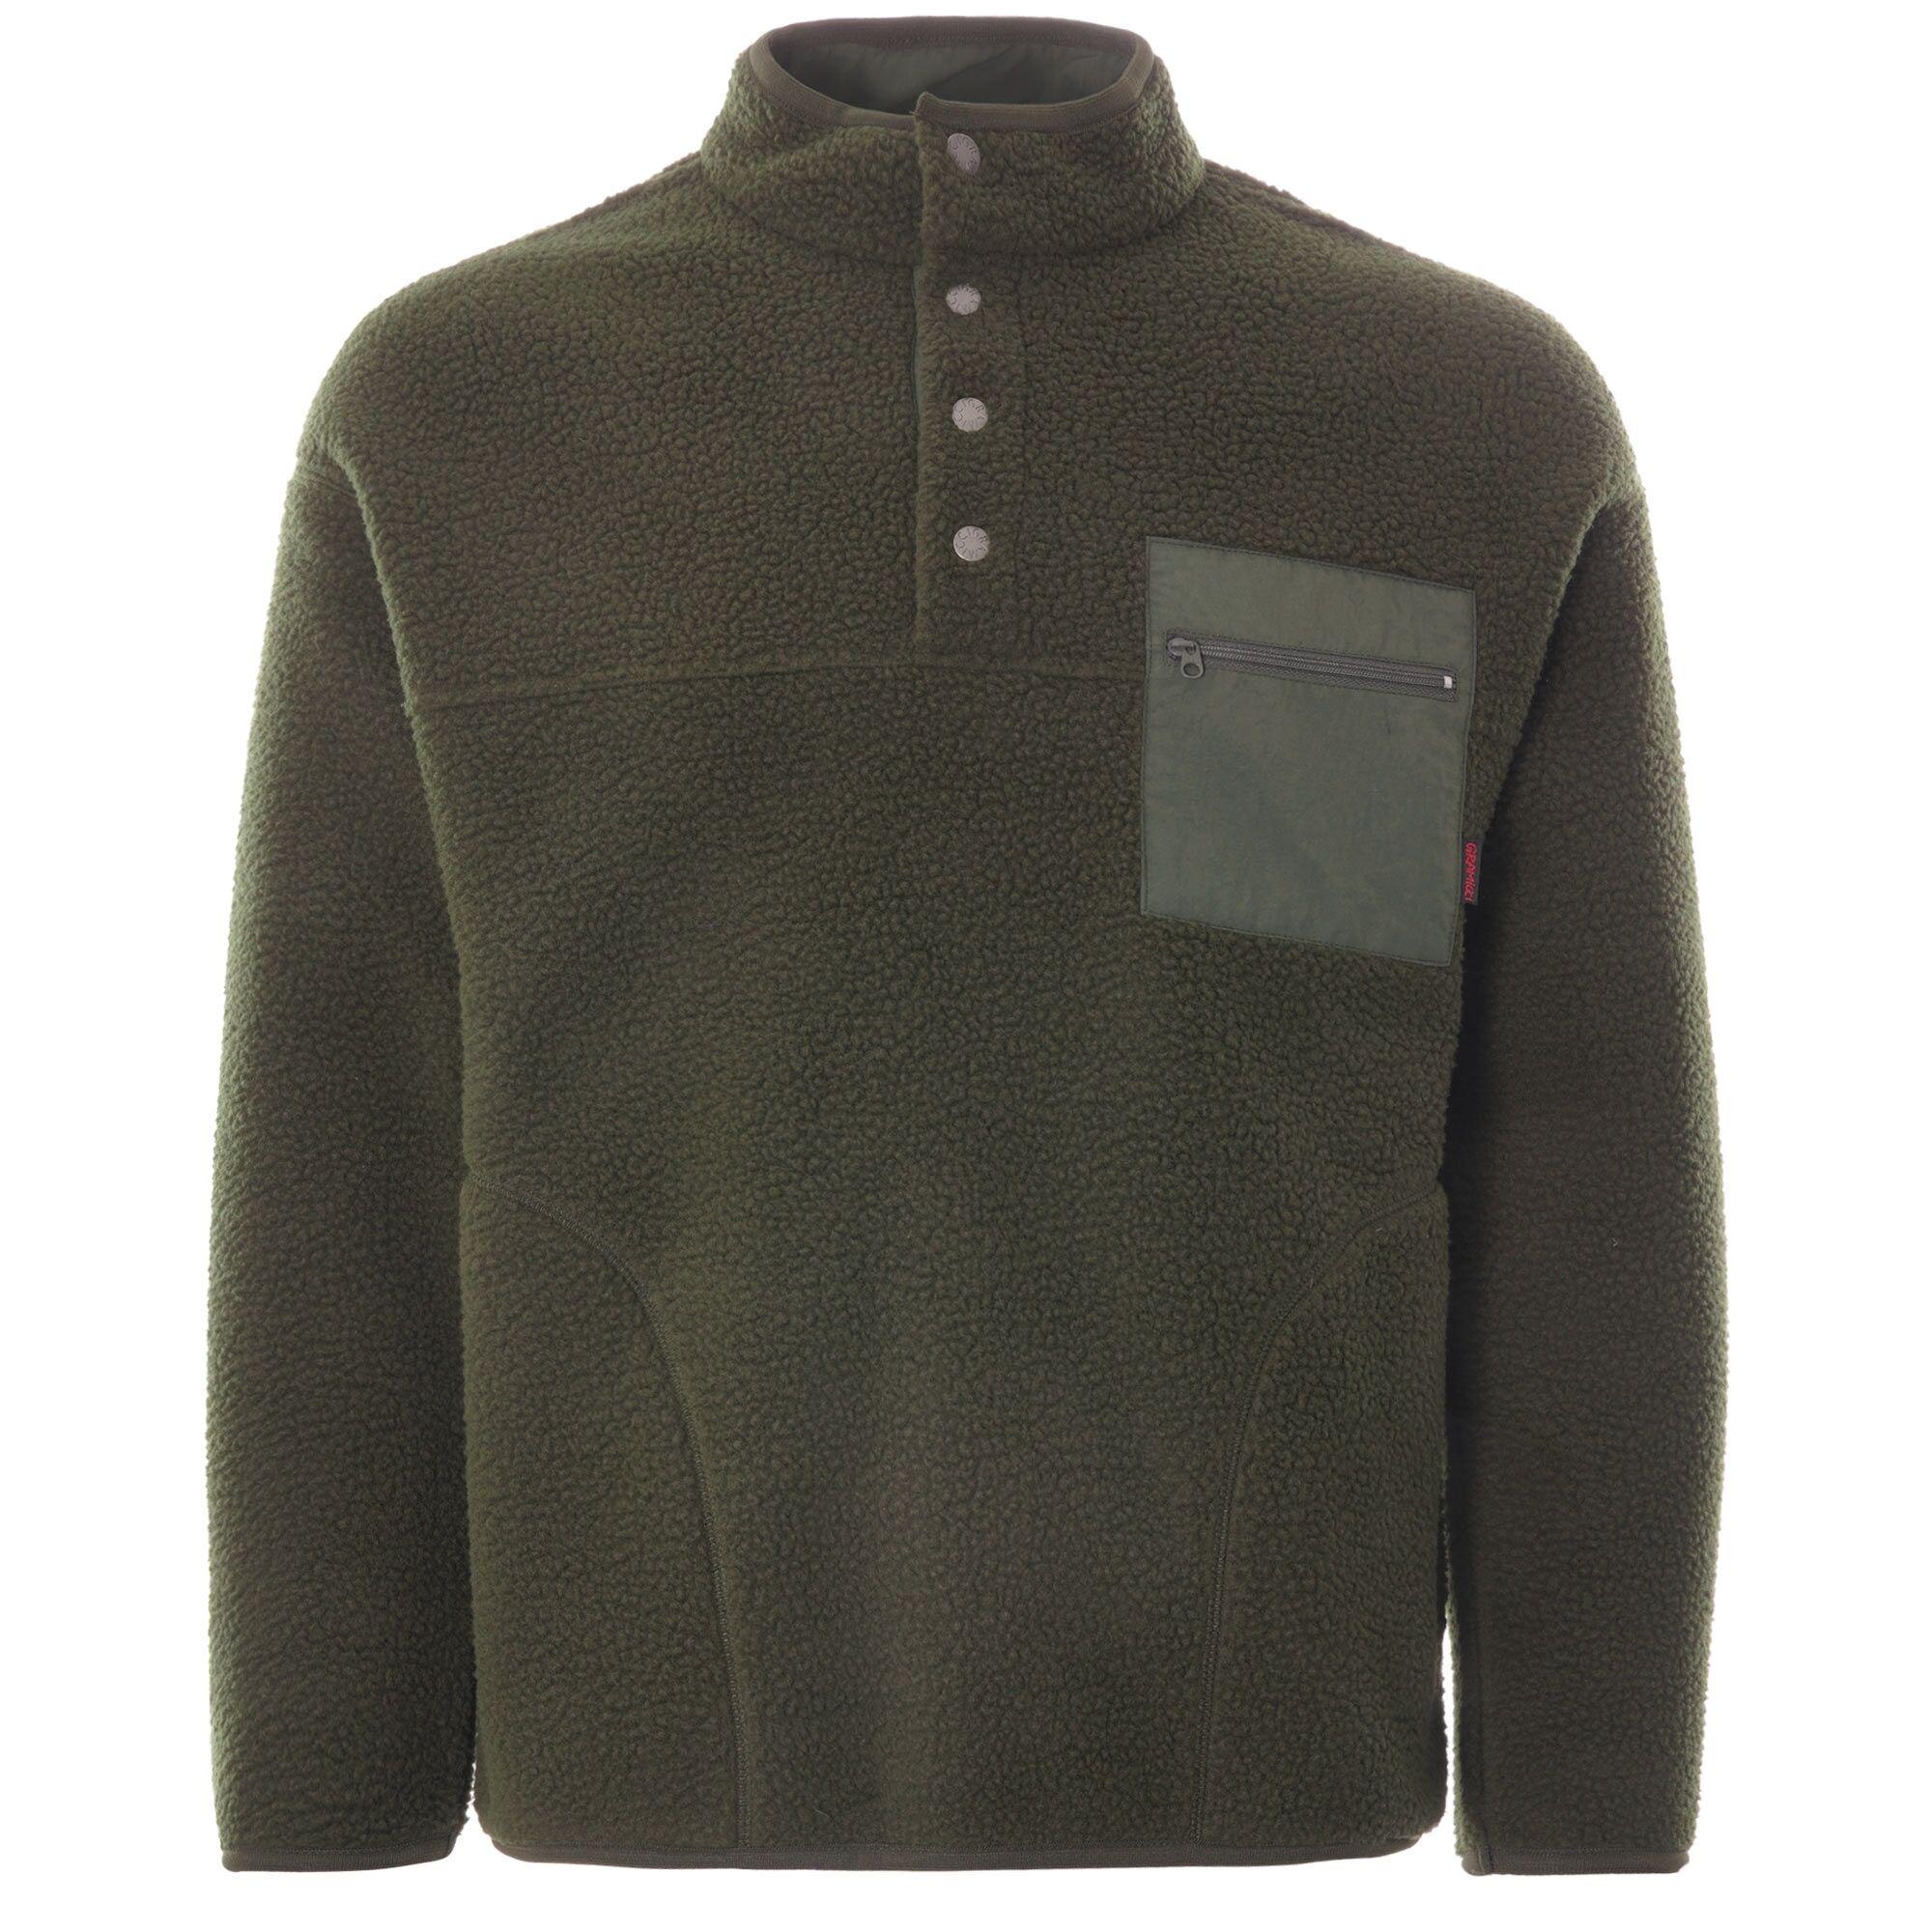 Gramicci Boa Fleece Zip Jacket   Olive   GM-410782 OLV